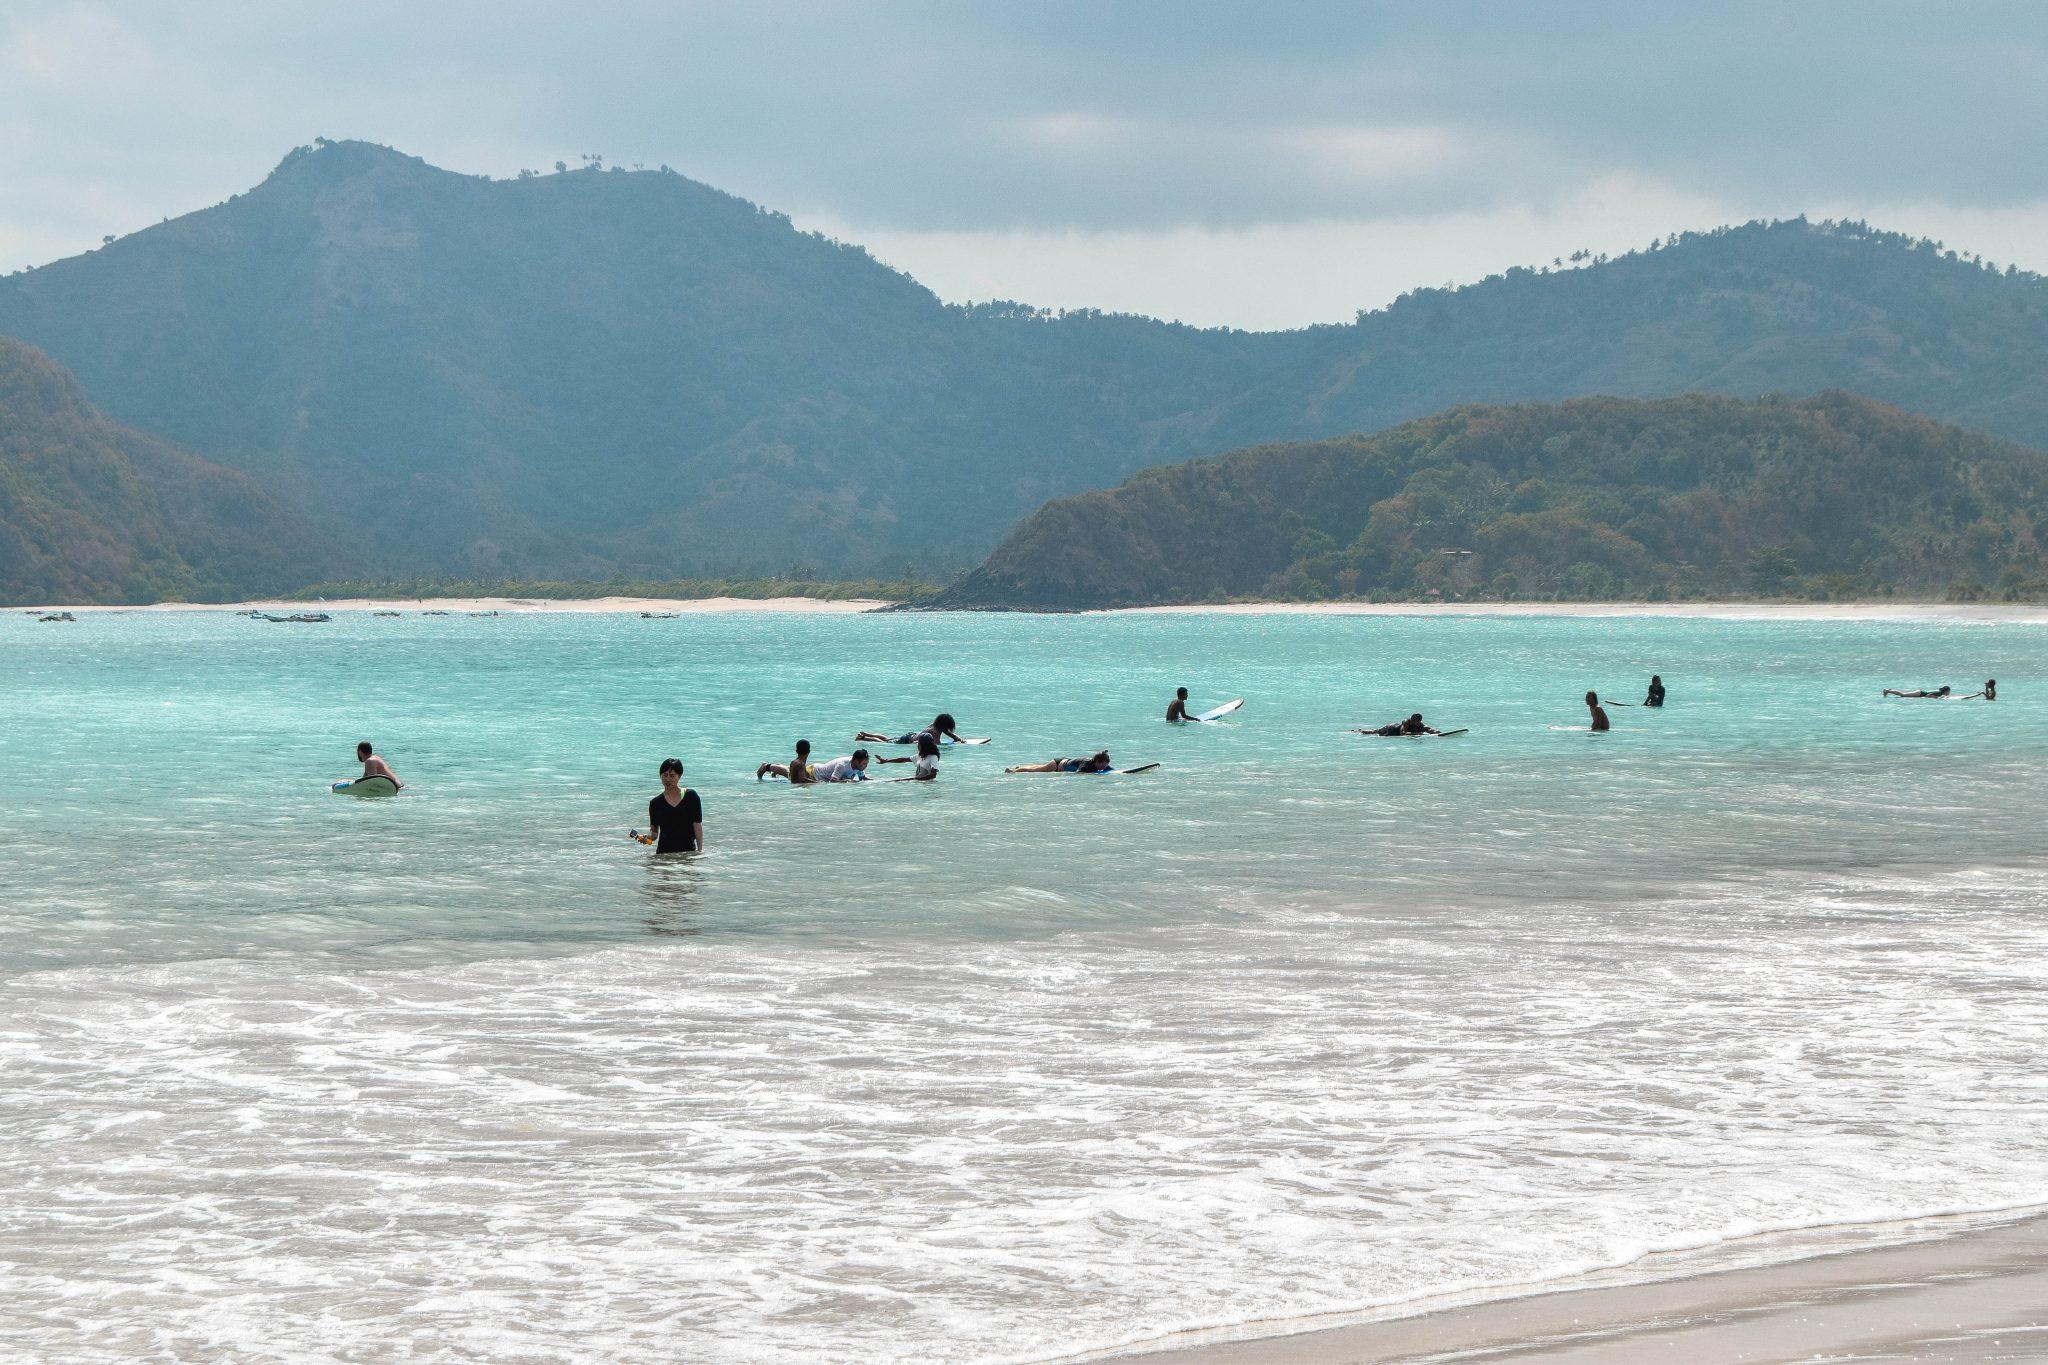 Wanderers & Warriors - Selong Belanak Beach Lombok Surfing Things To Do In Kuta Lombok